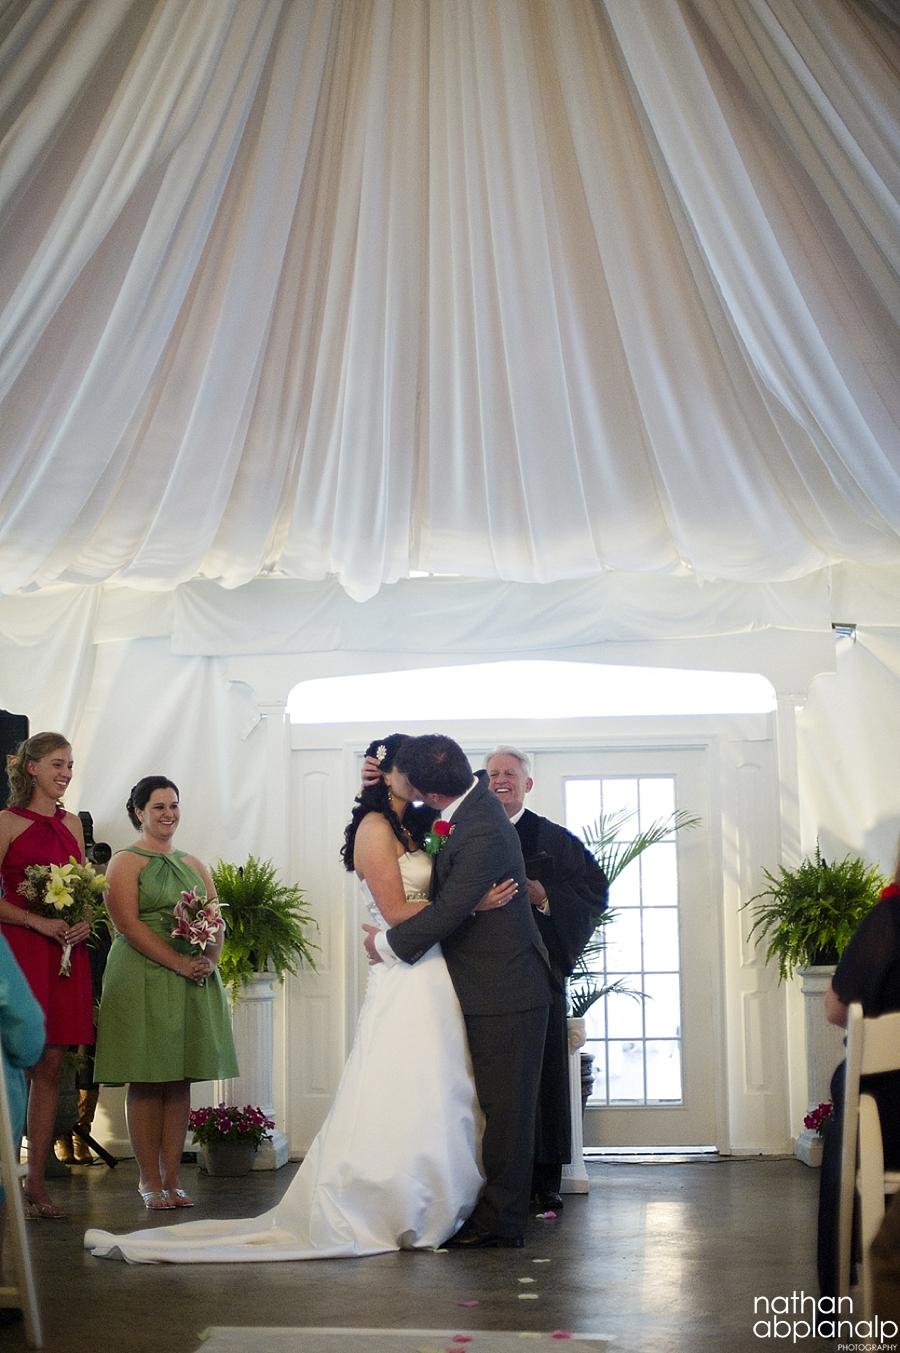 Nathan Abplanalp - Charlotte Wedding Photographer (9)